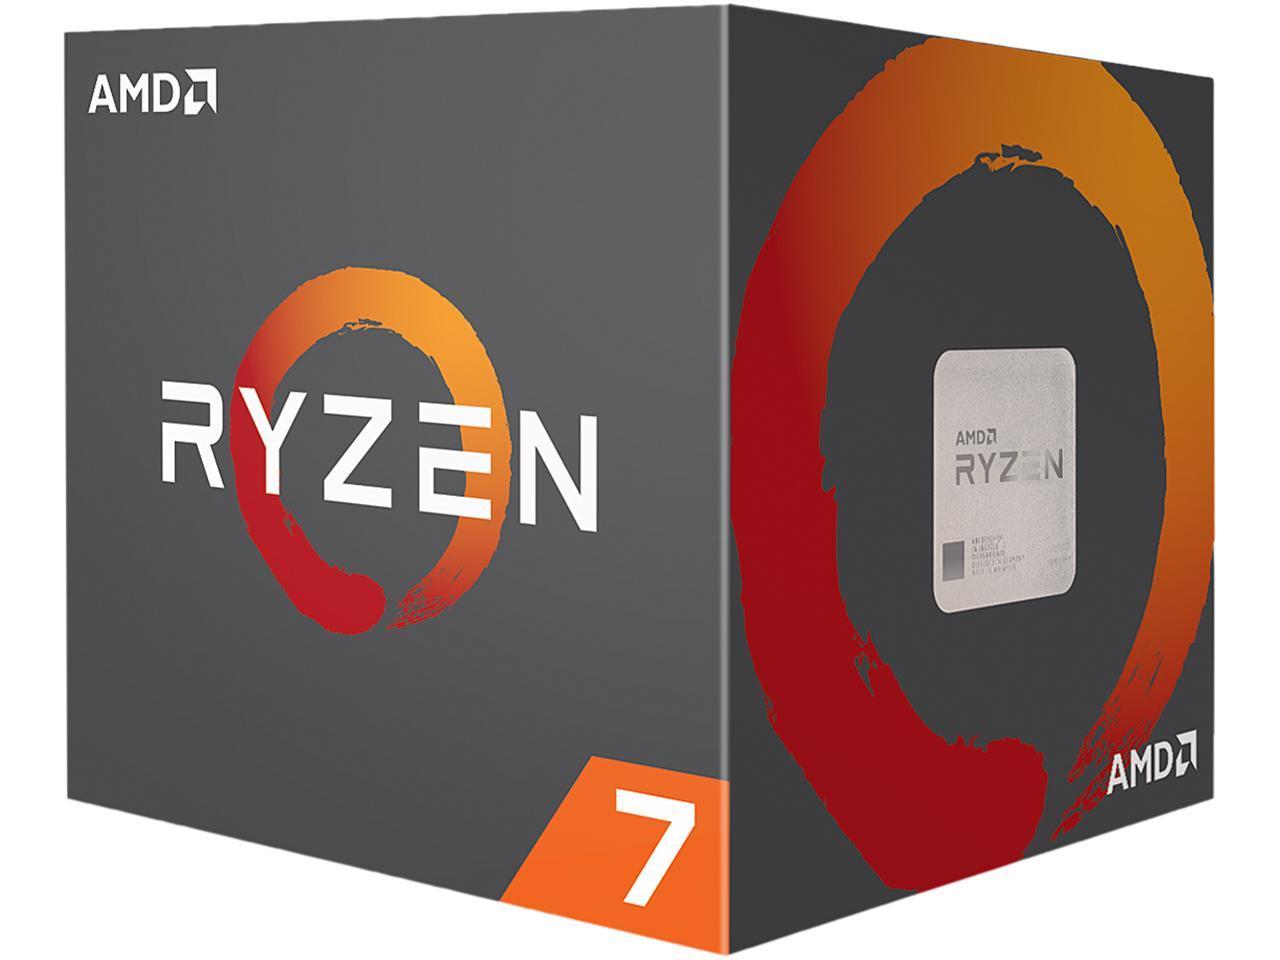 Newegg: AMD Ryzen 7 @ 4.99 + Free Shipping